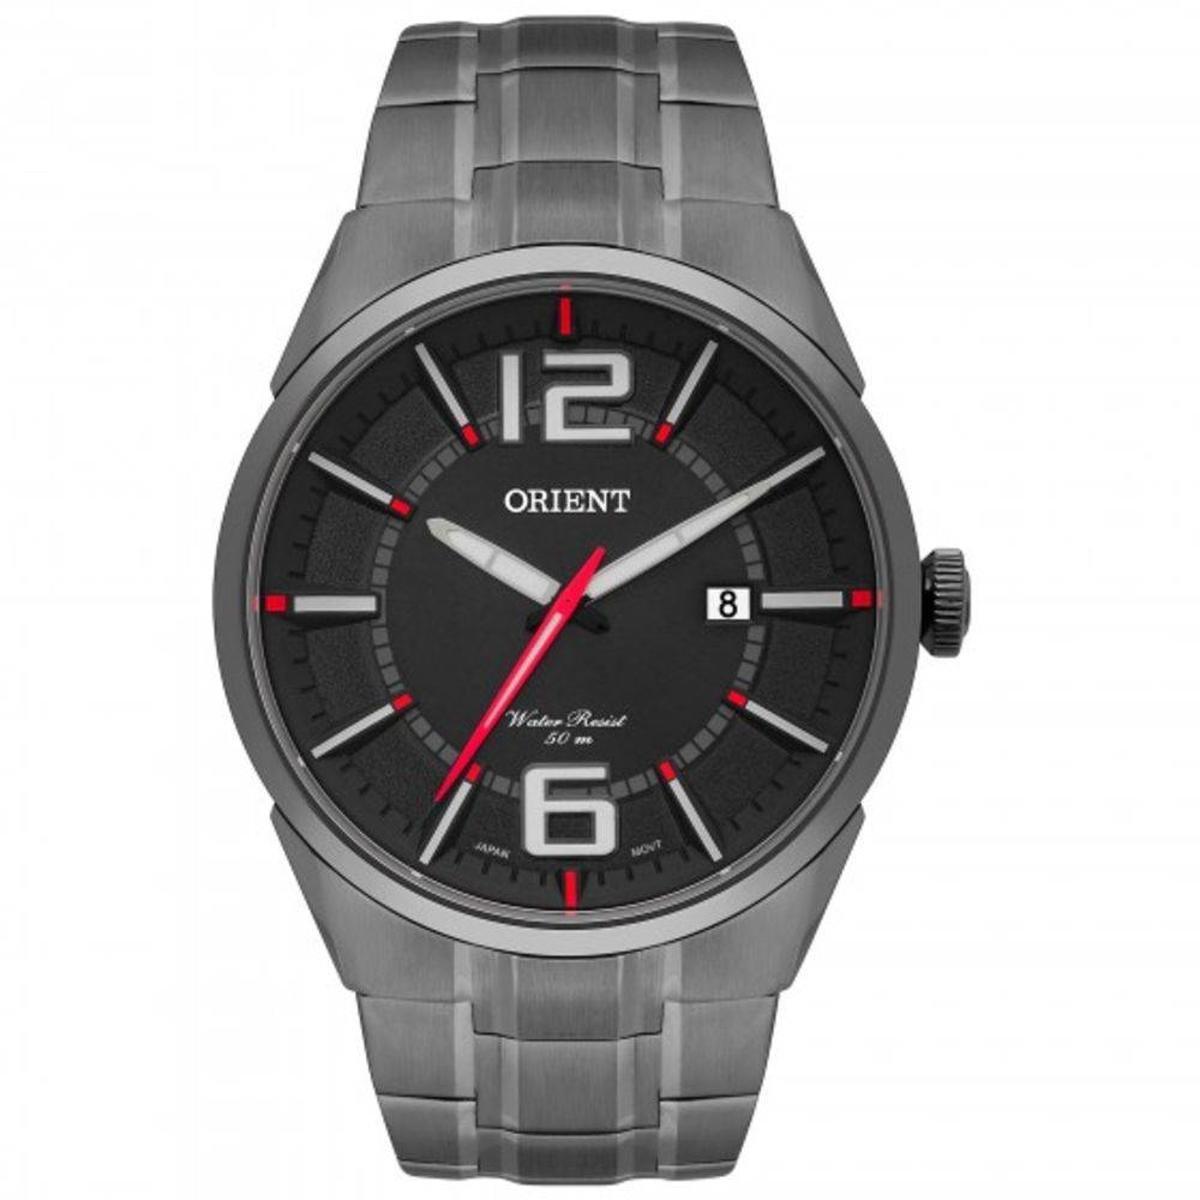 35bbd98b3 Relógio Masculino Orient Analógico Mpss1004 G2gx - Compre Agora ...